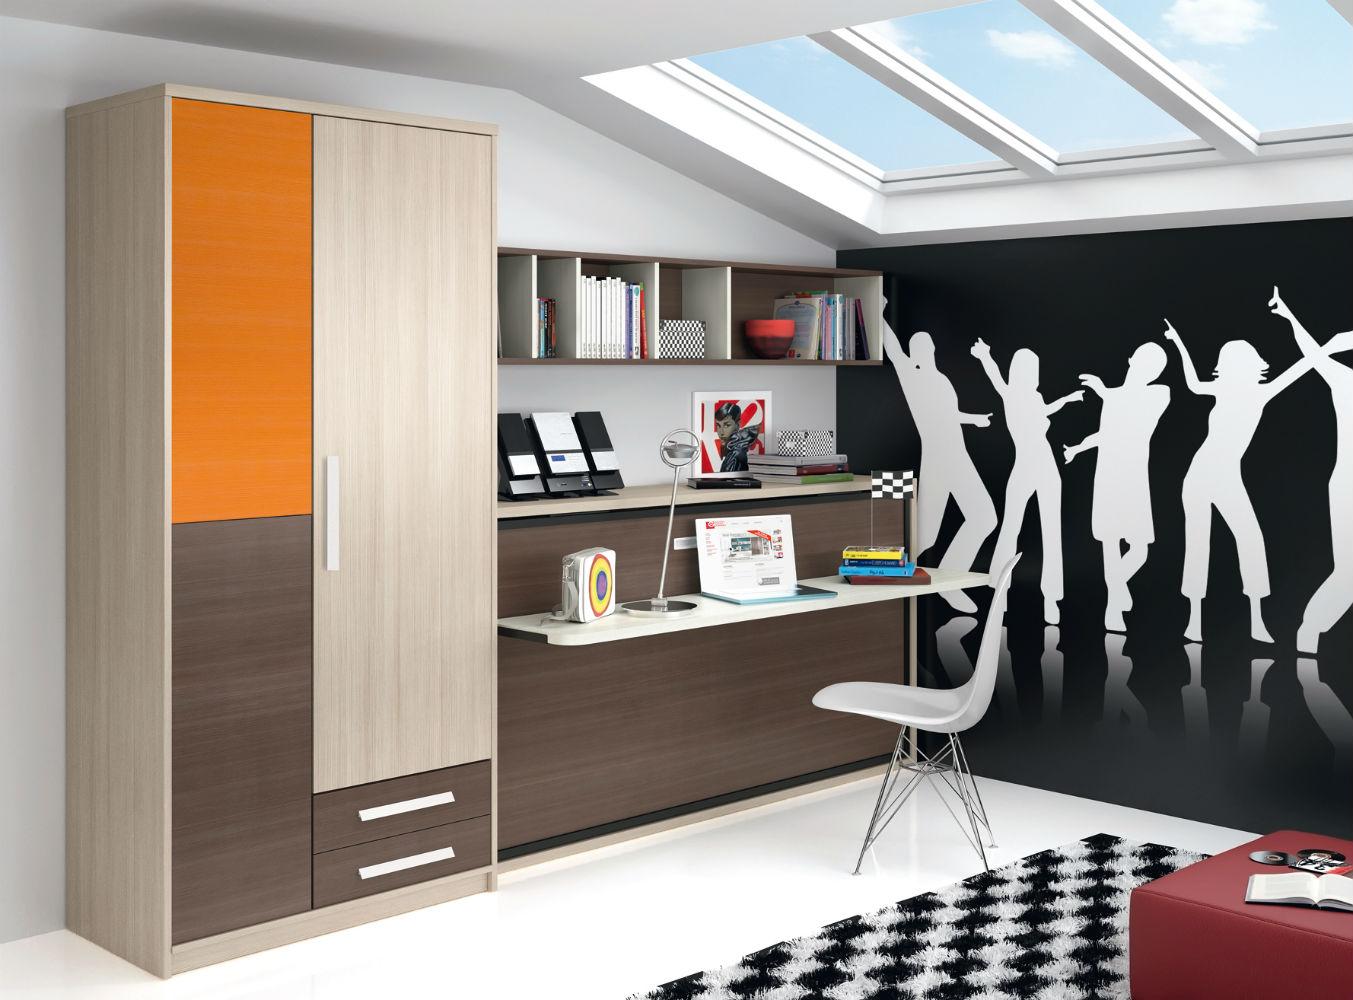 Dormitorio infantil juvenil moderno literas abatibles 69 f215 for Dormitorio juvenil cama abatible